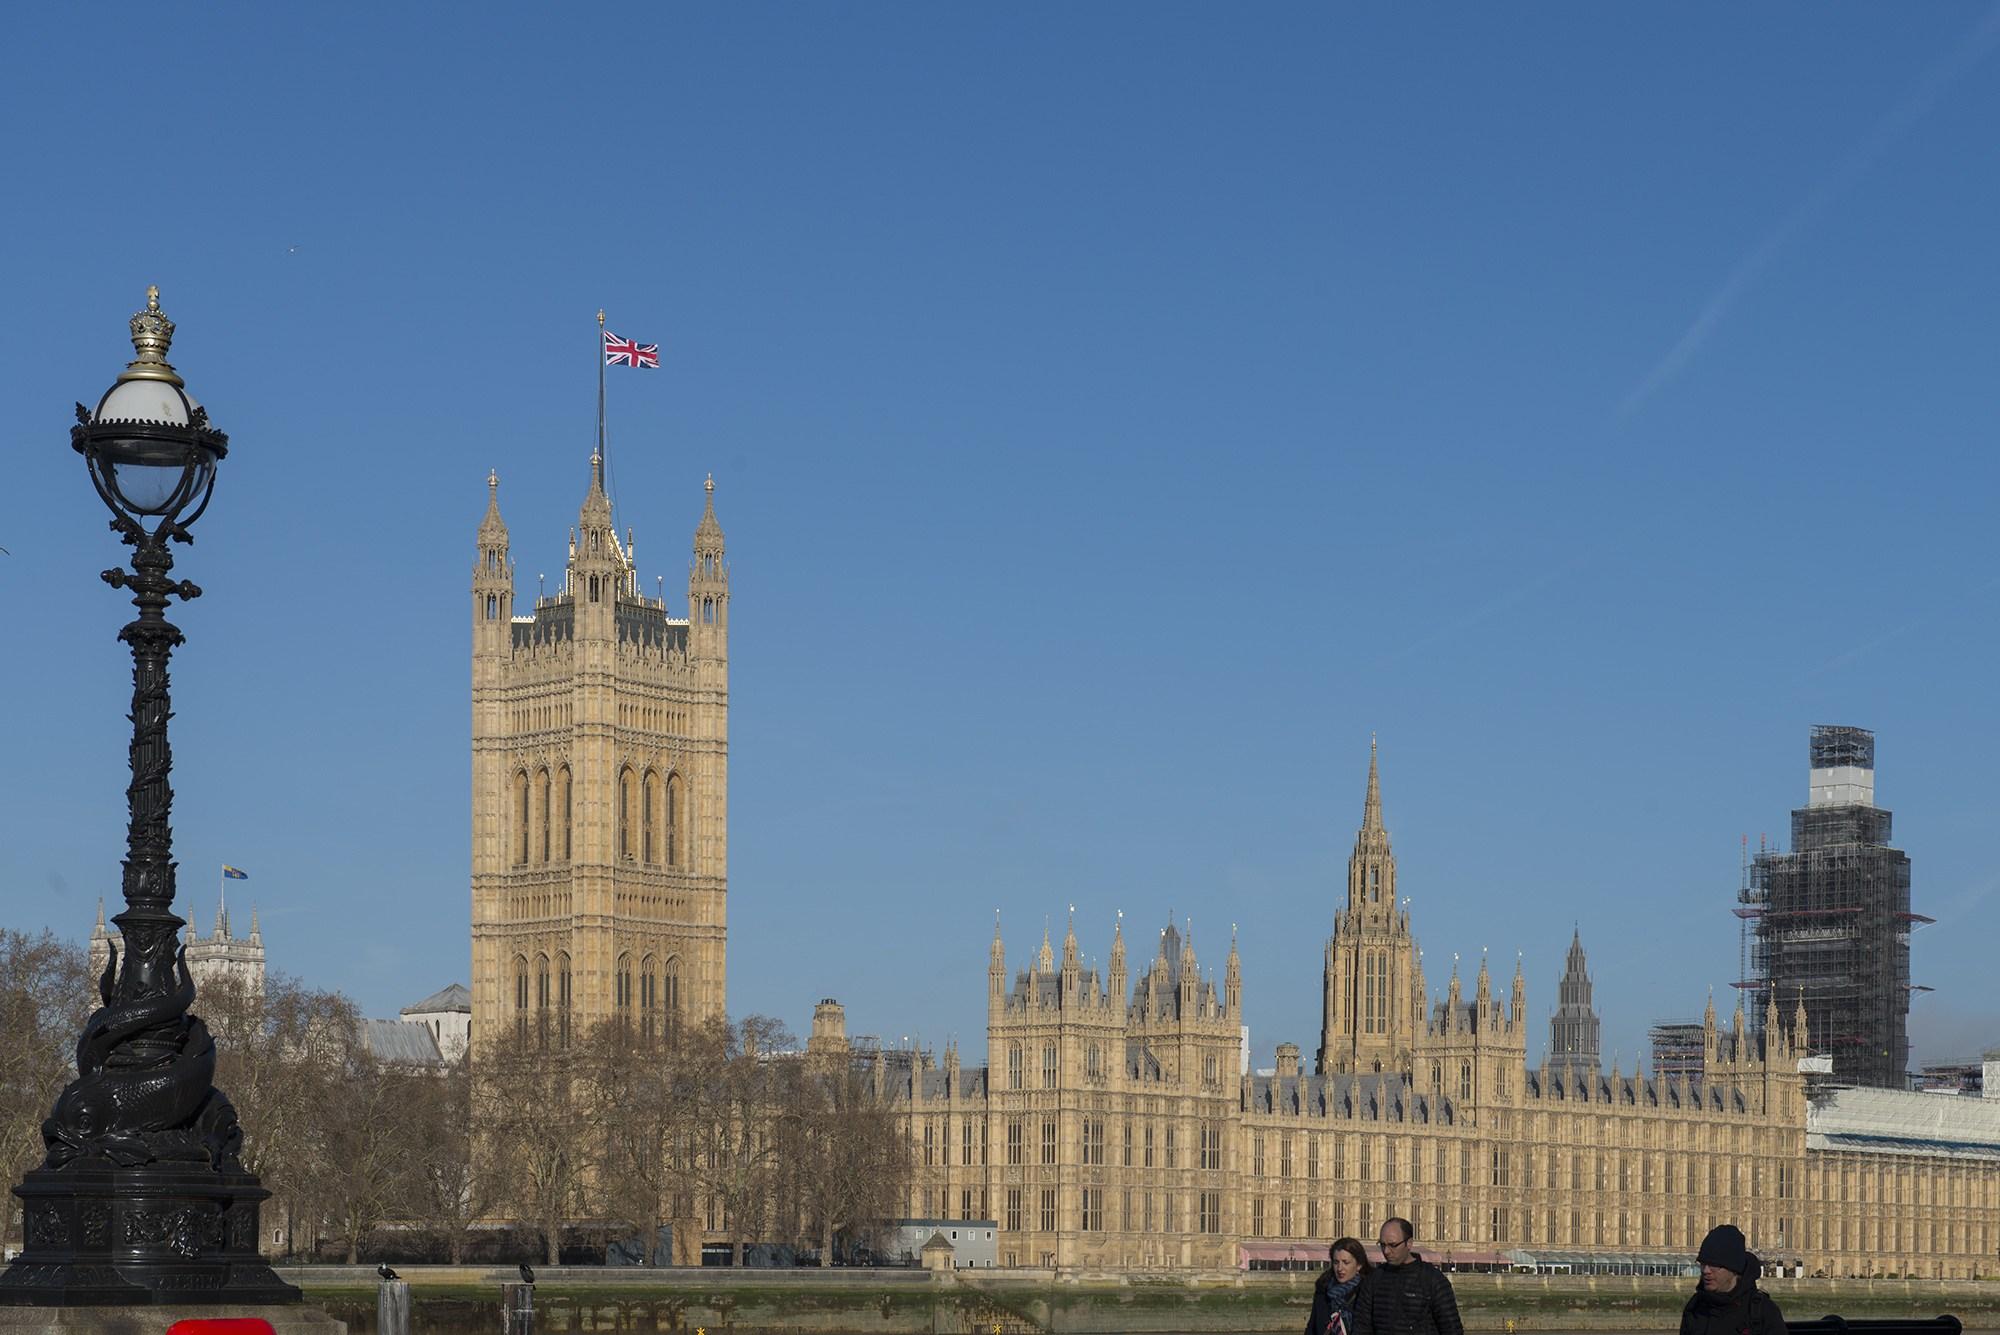 Parliament001.jpg